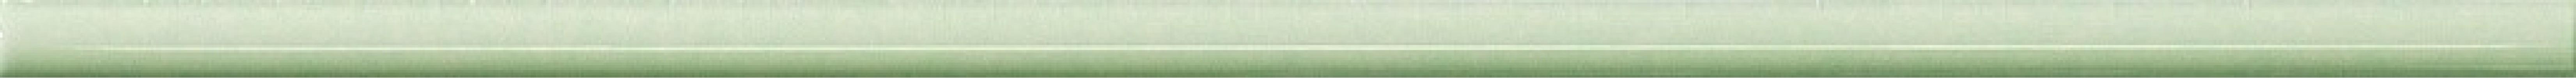 Бордюр Antica Ceramica Rubiera Alterego List. Verde 1x40 201428